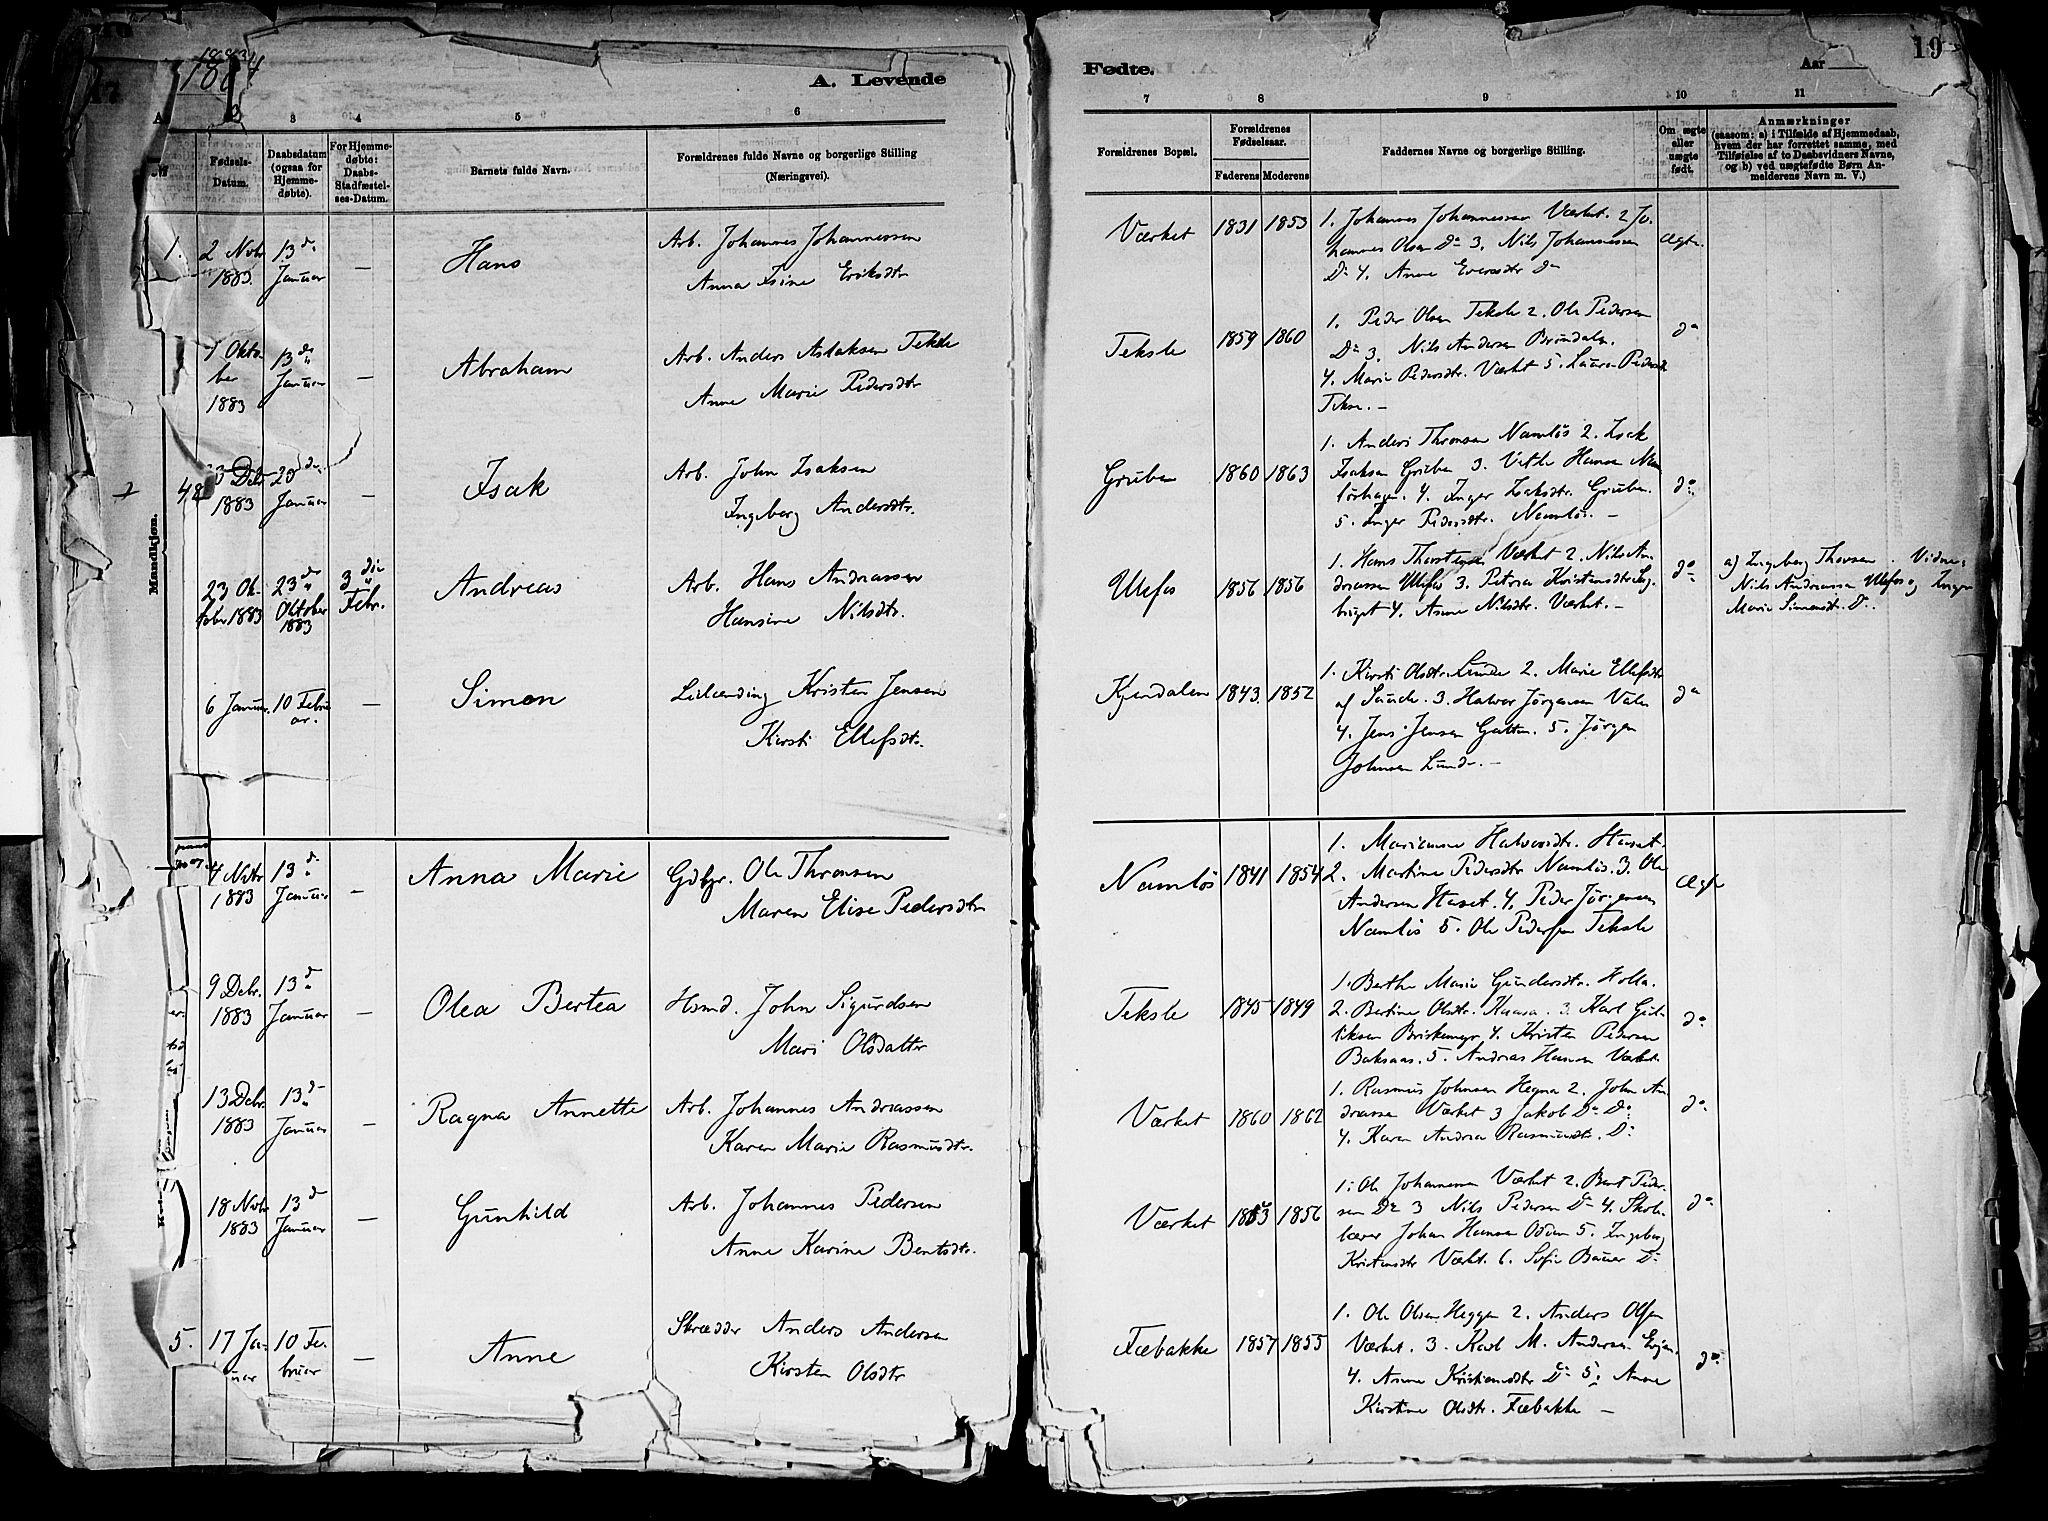 SAKO, Holla kirkebøker, F/Fa/L0008: Ministerialbok nr. 8, 1882-1897, s. 18